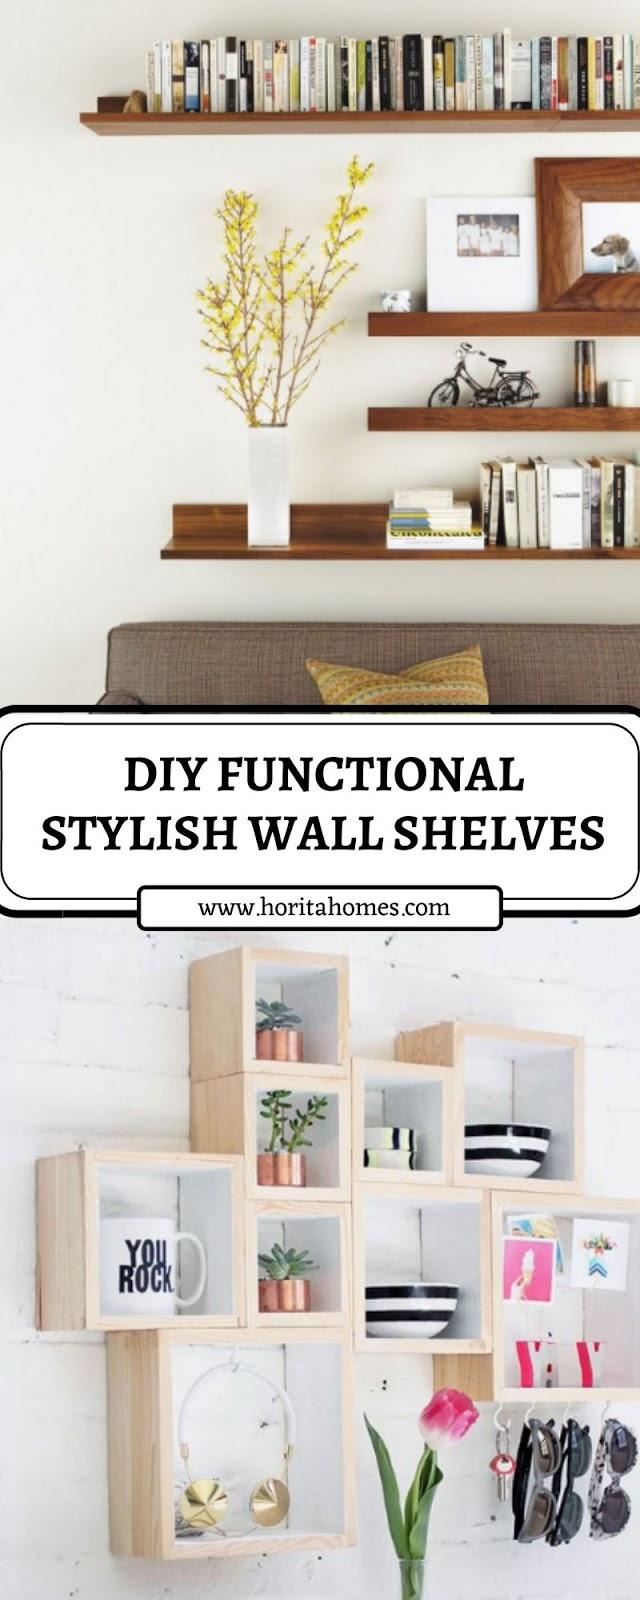 DIY FUNCTIONAL STYLISH WALL SHELVES